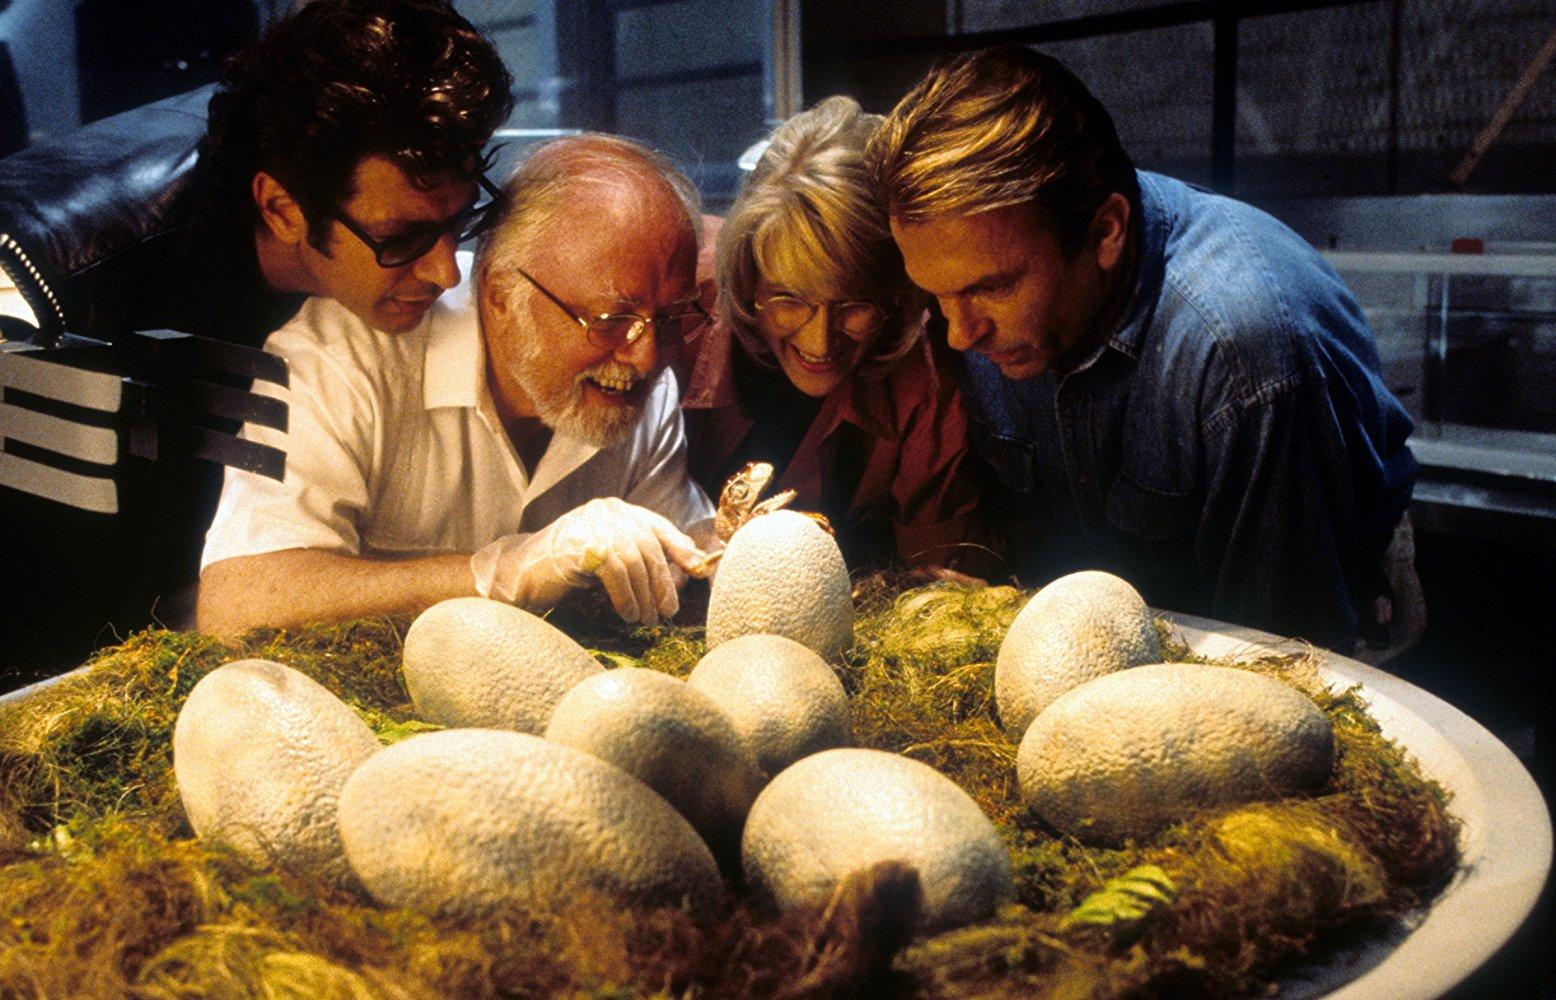 Jeff Goldblum, Richard Attenborough, Laura Dern, and Sam Neill look at dinosaur eggs in JURASSIC PARK (1993)